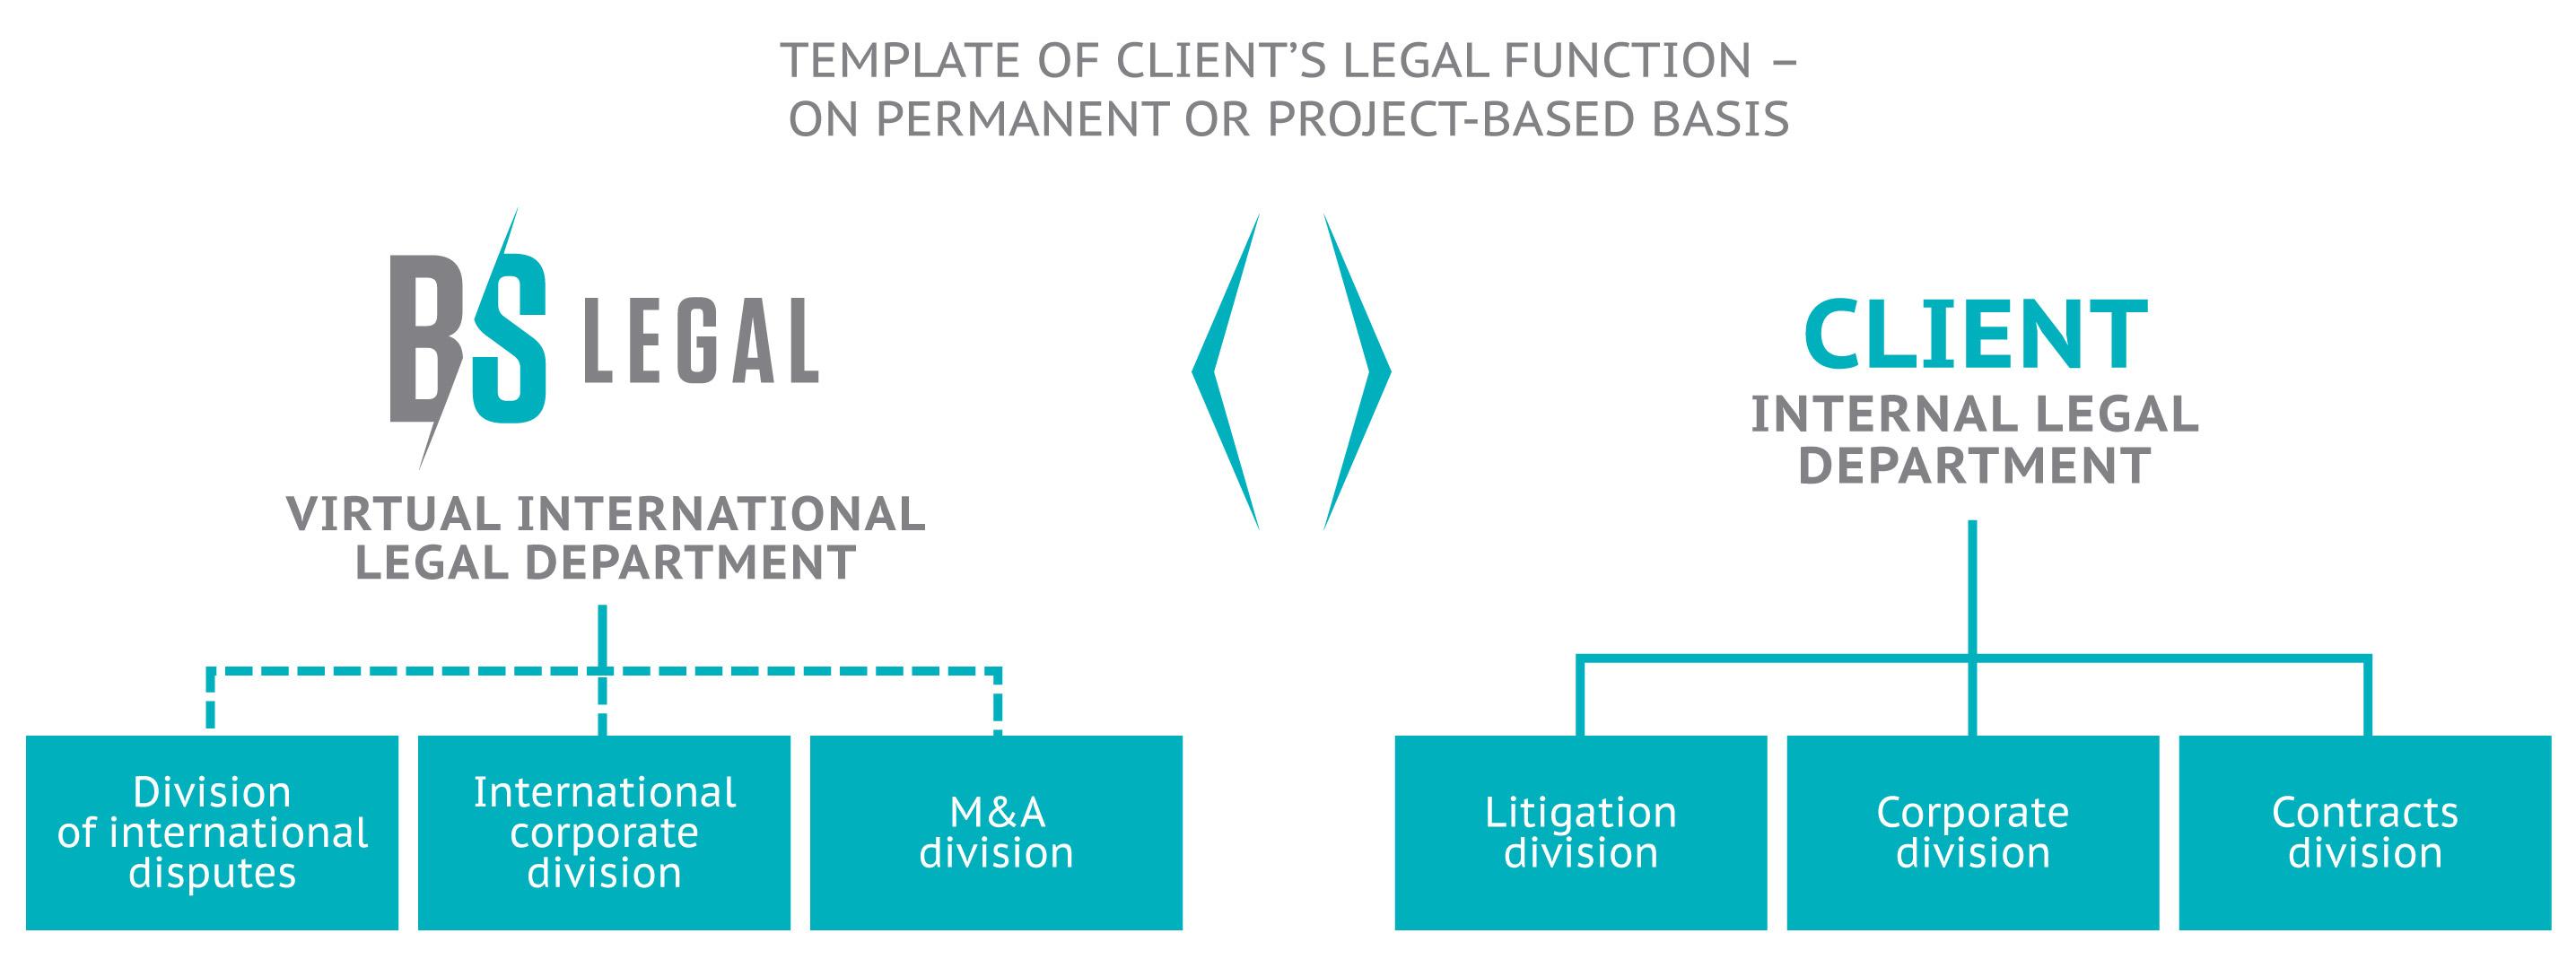 B&S as client's virtual international legal department